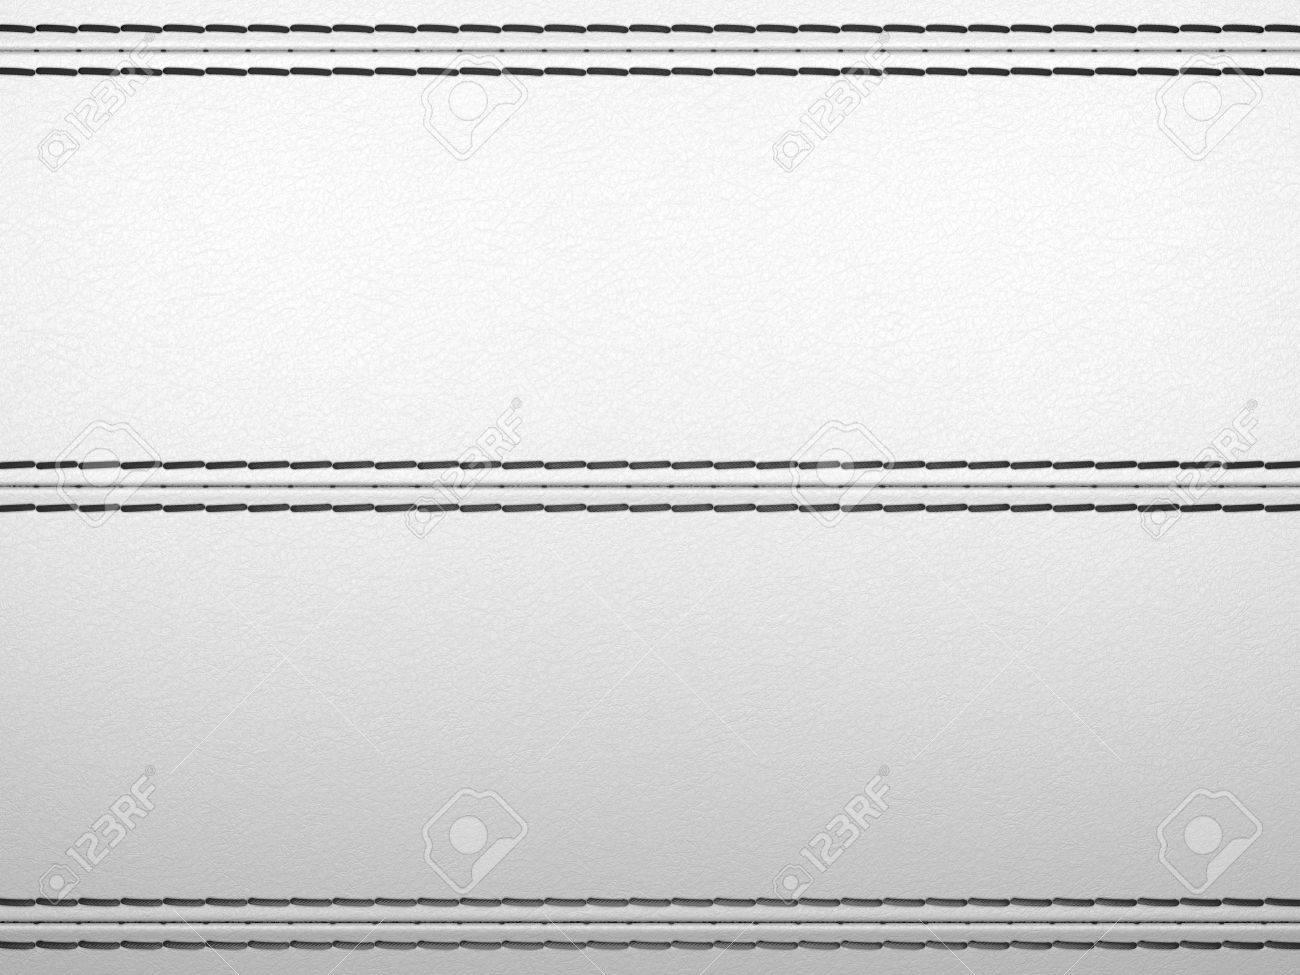 Light grey horizontal stitched leather background. Large resolution Stock Photo - 9404838